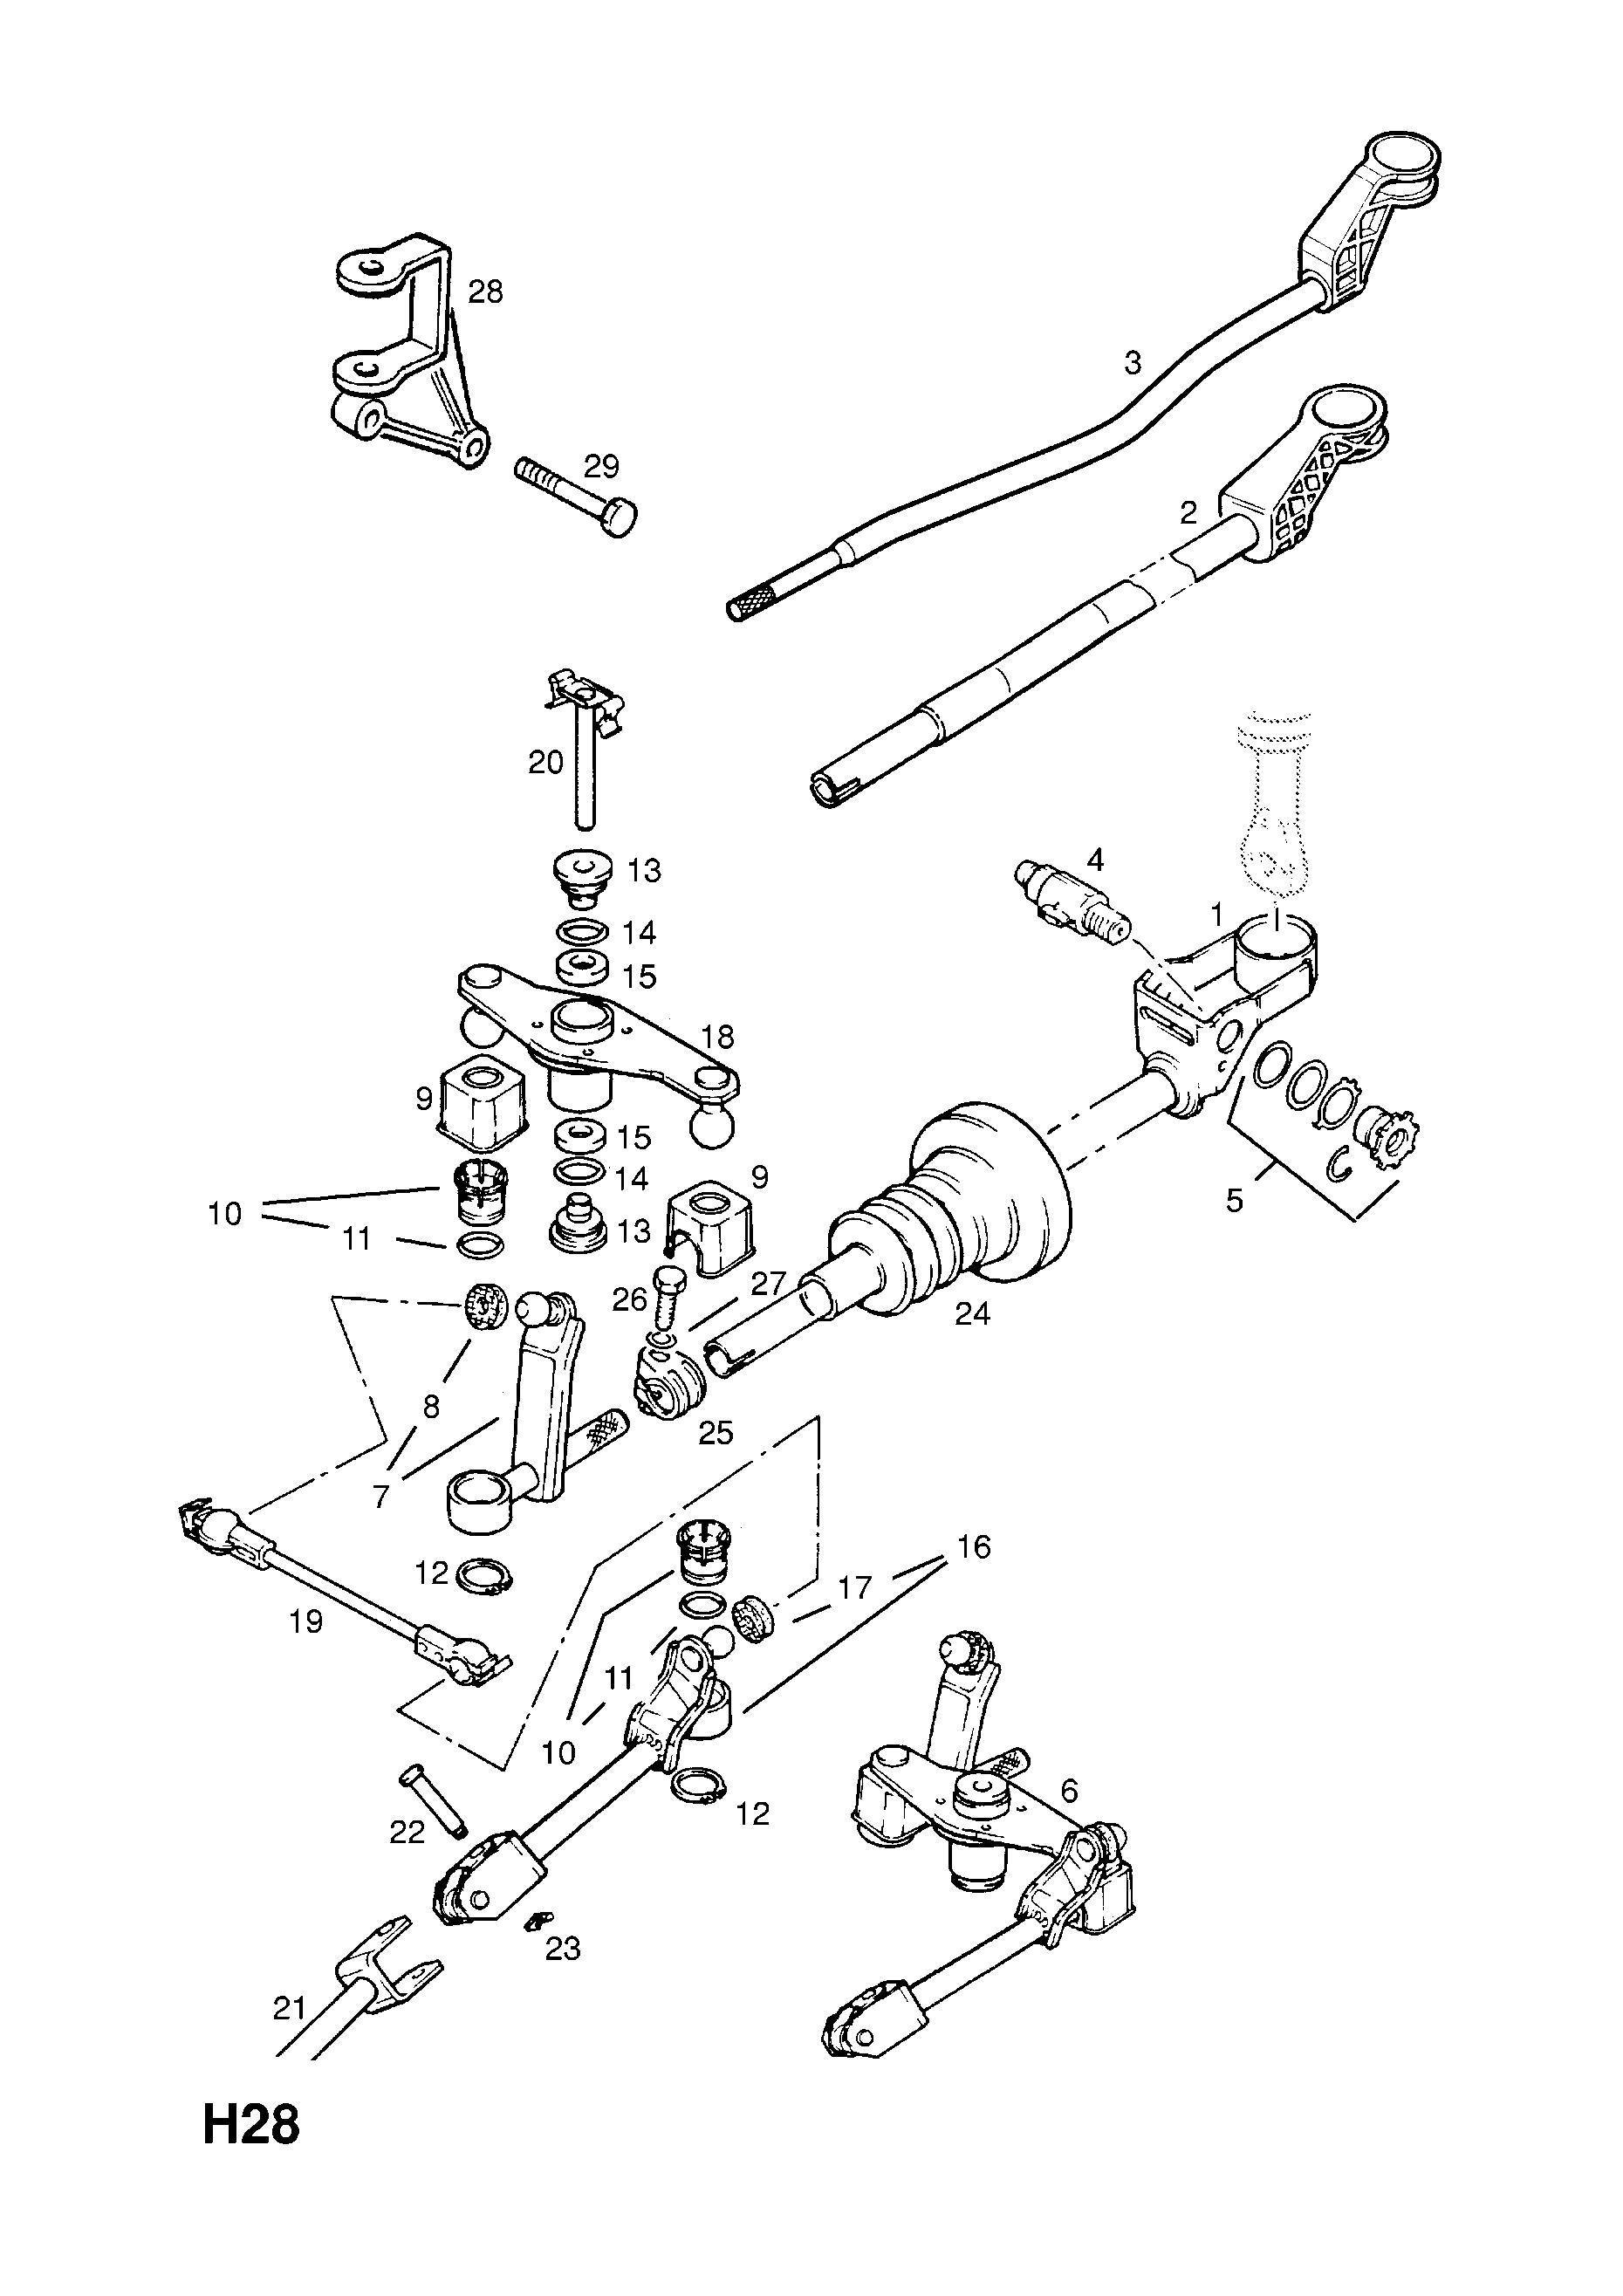 opel calibra 1989 1997 h transmission 6 used with five speed 10 Bolt Rear End Parts gm part number genuine part number description range